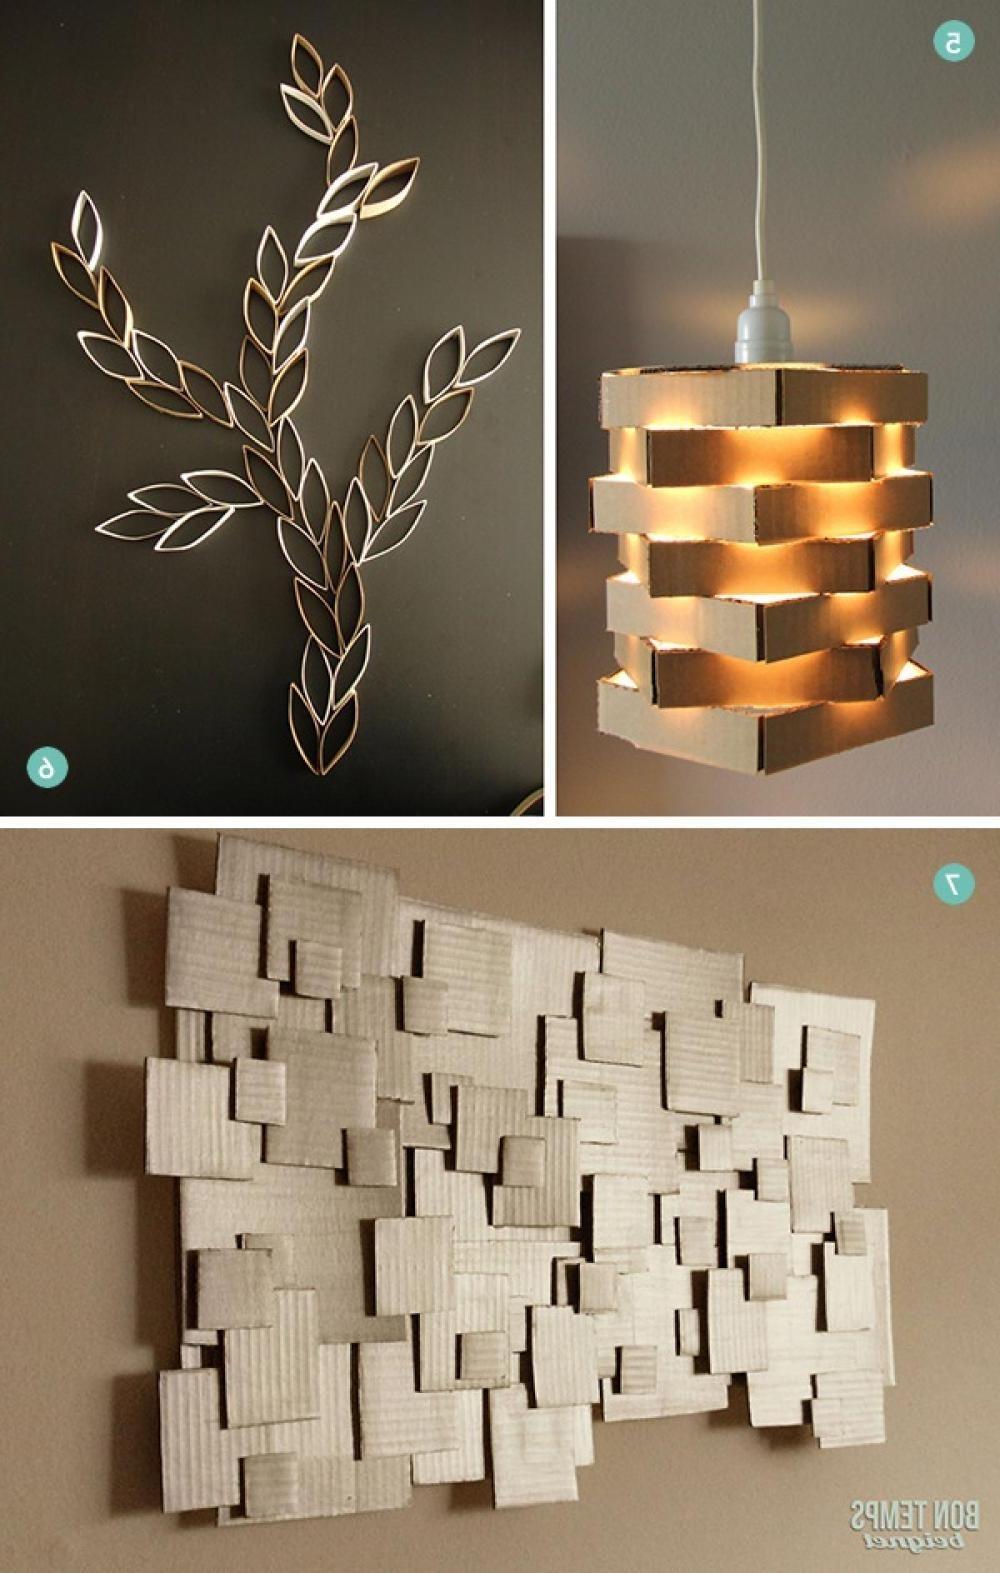 Modern Wall Art Decor Style : Elegance Modern Wall Art Decor In Latest Contemporary Wall Art Decors (Gallery 8 of 20)